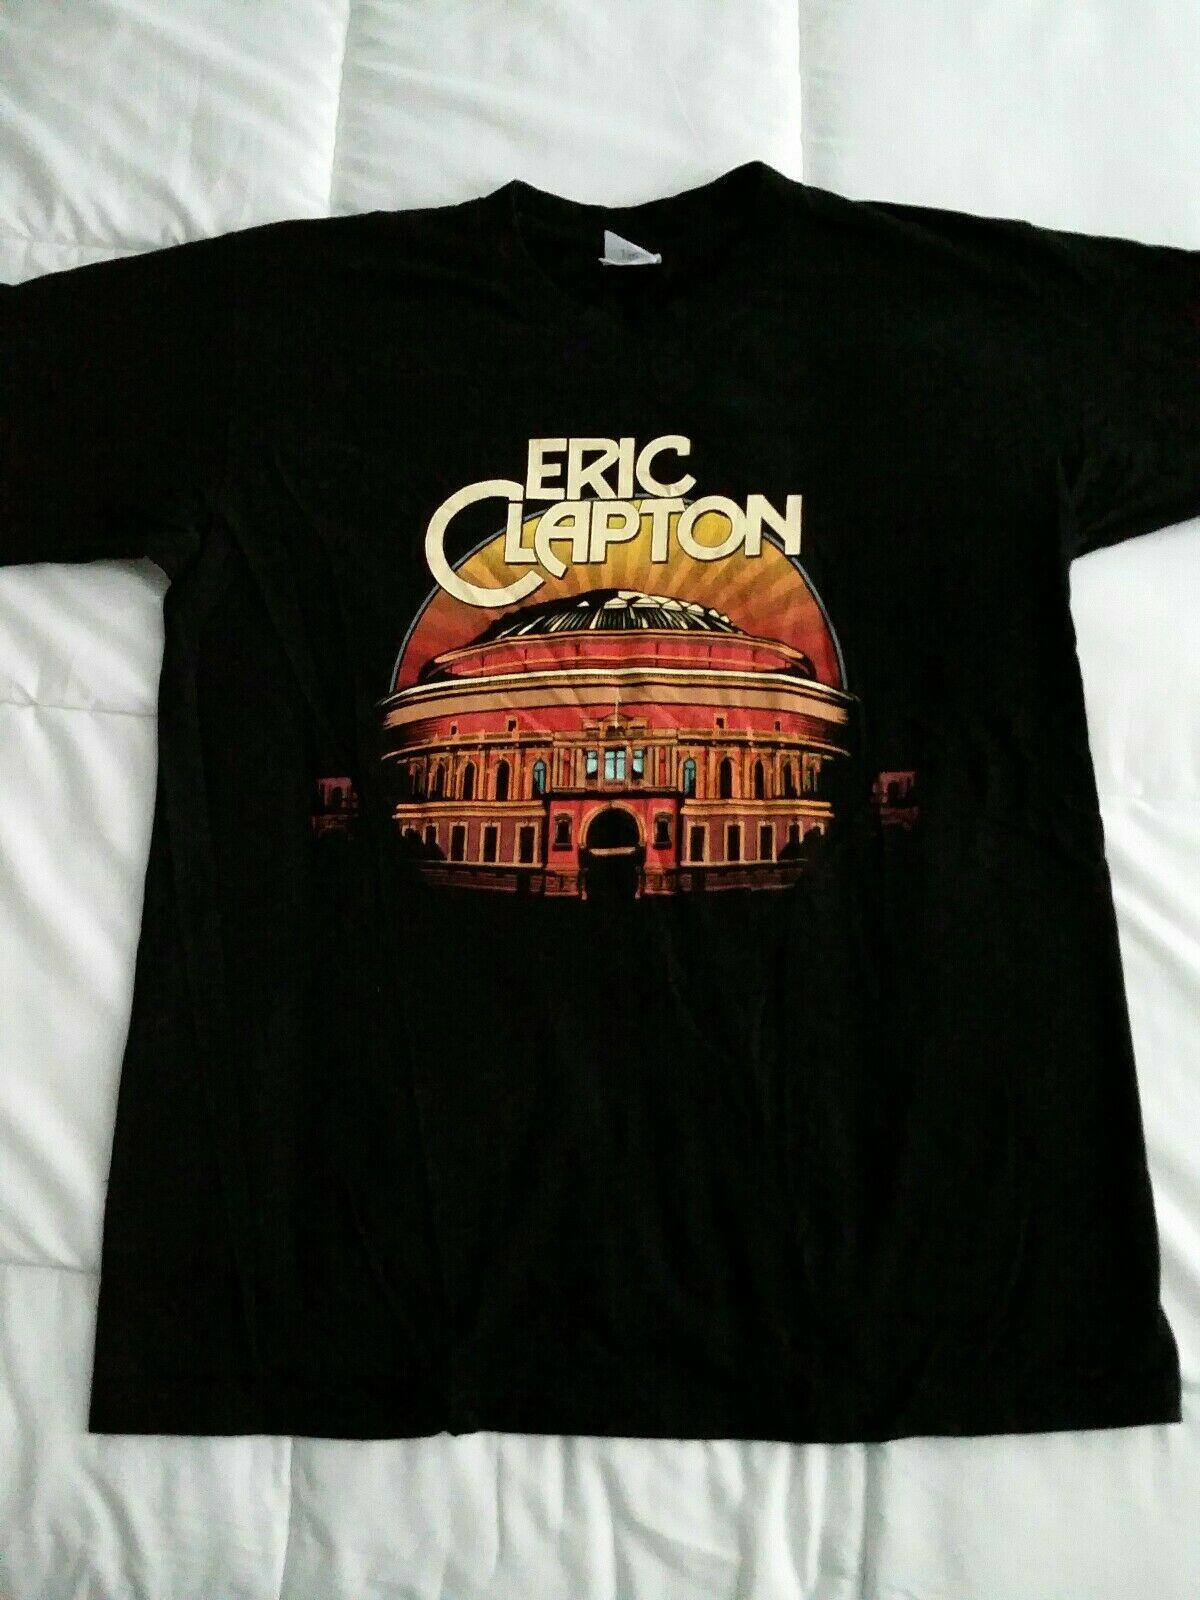 Fashion Eric Clapton 2020 Concert Tour T-Shirt Size S-5xl Casual Tops Men Popular T Shirt Short Sleeve The New Camisa